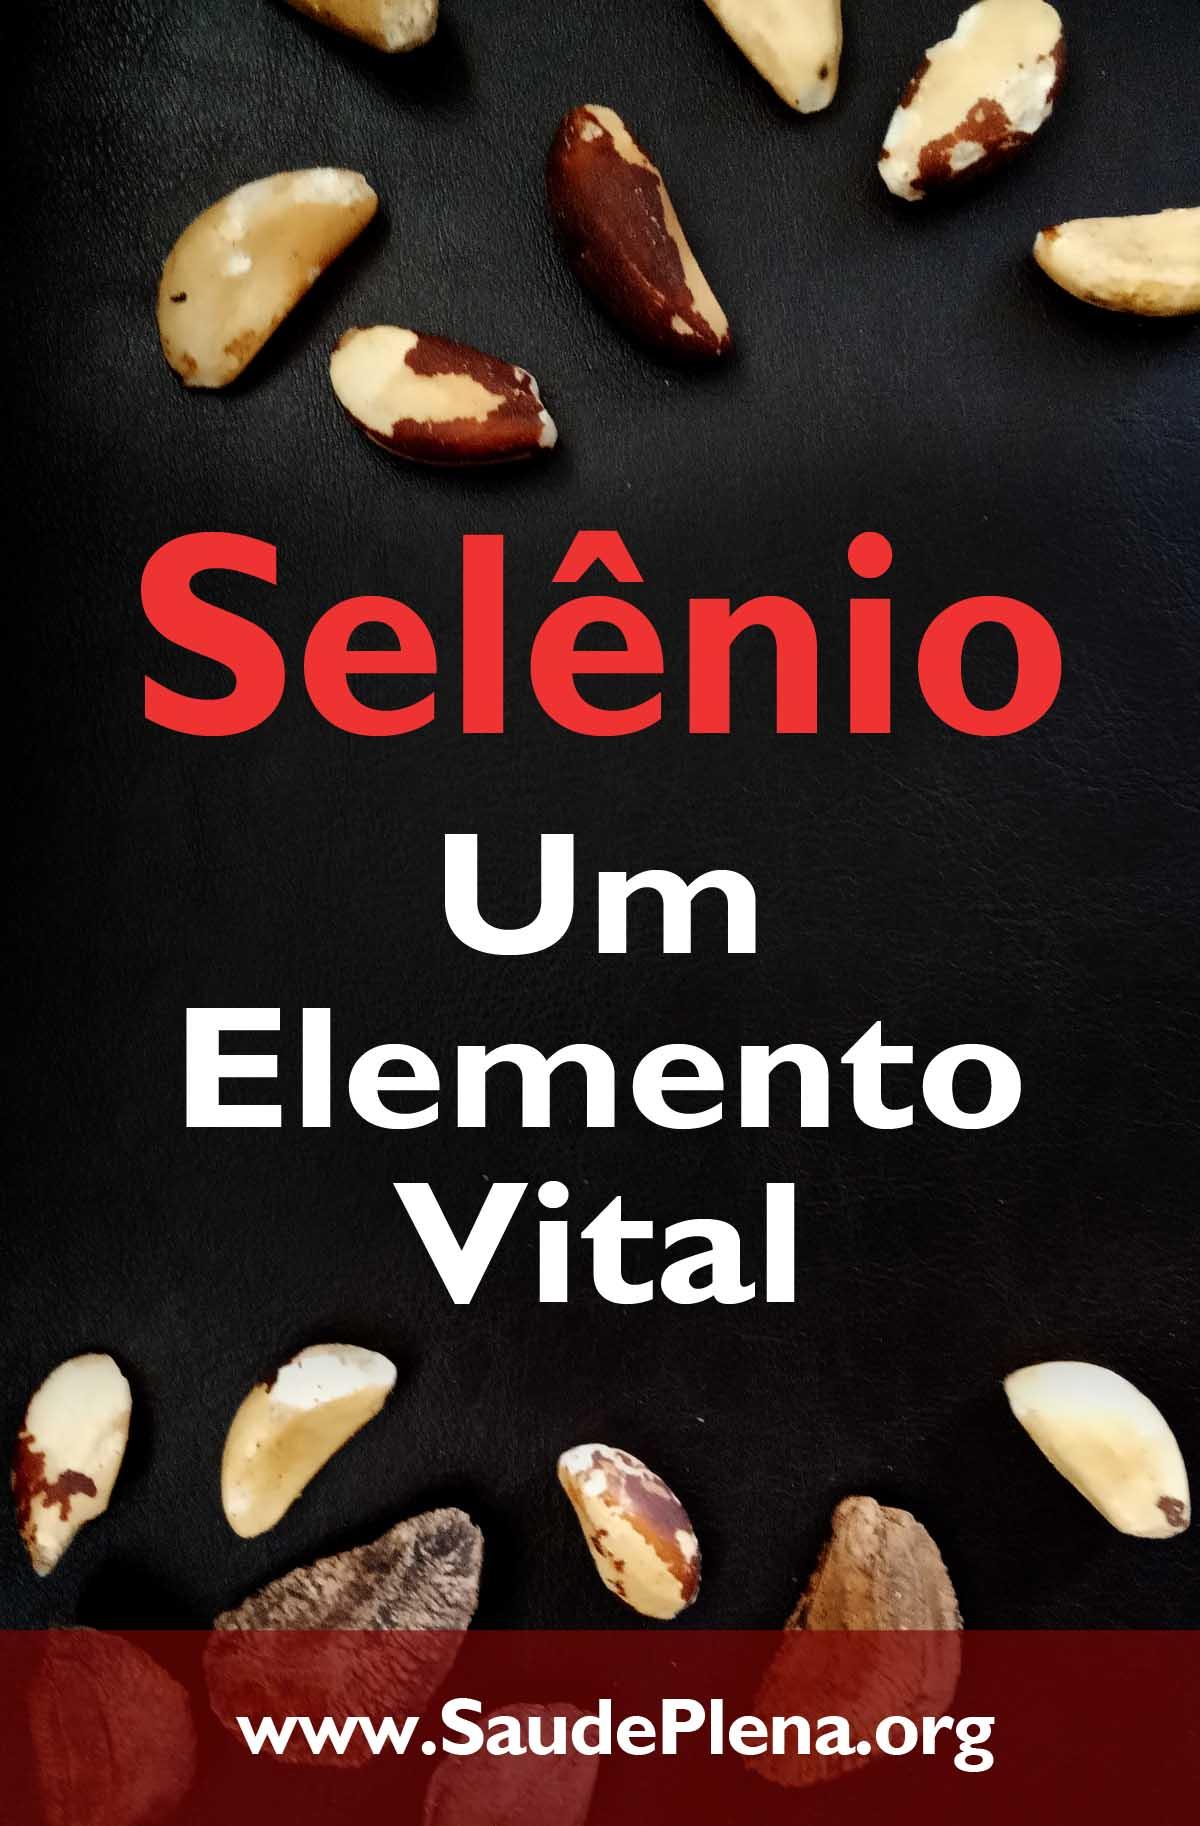 Selênio - Um Elemento Vital